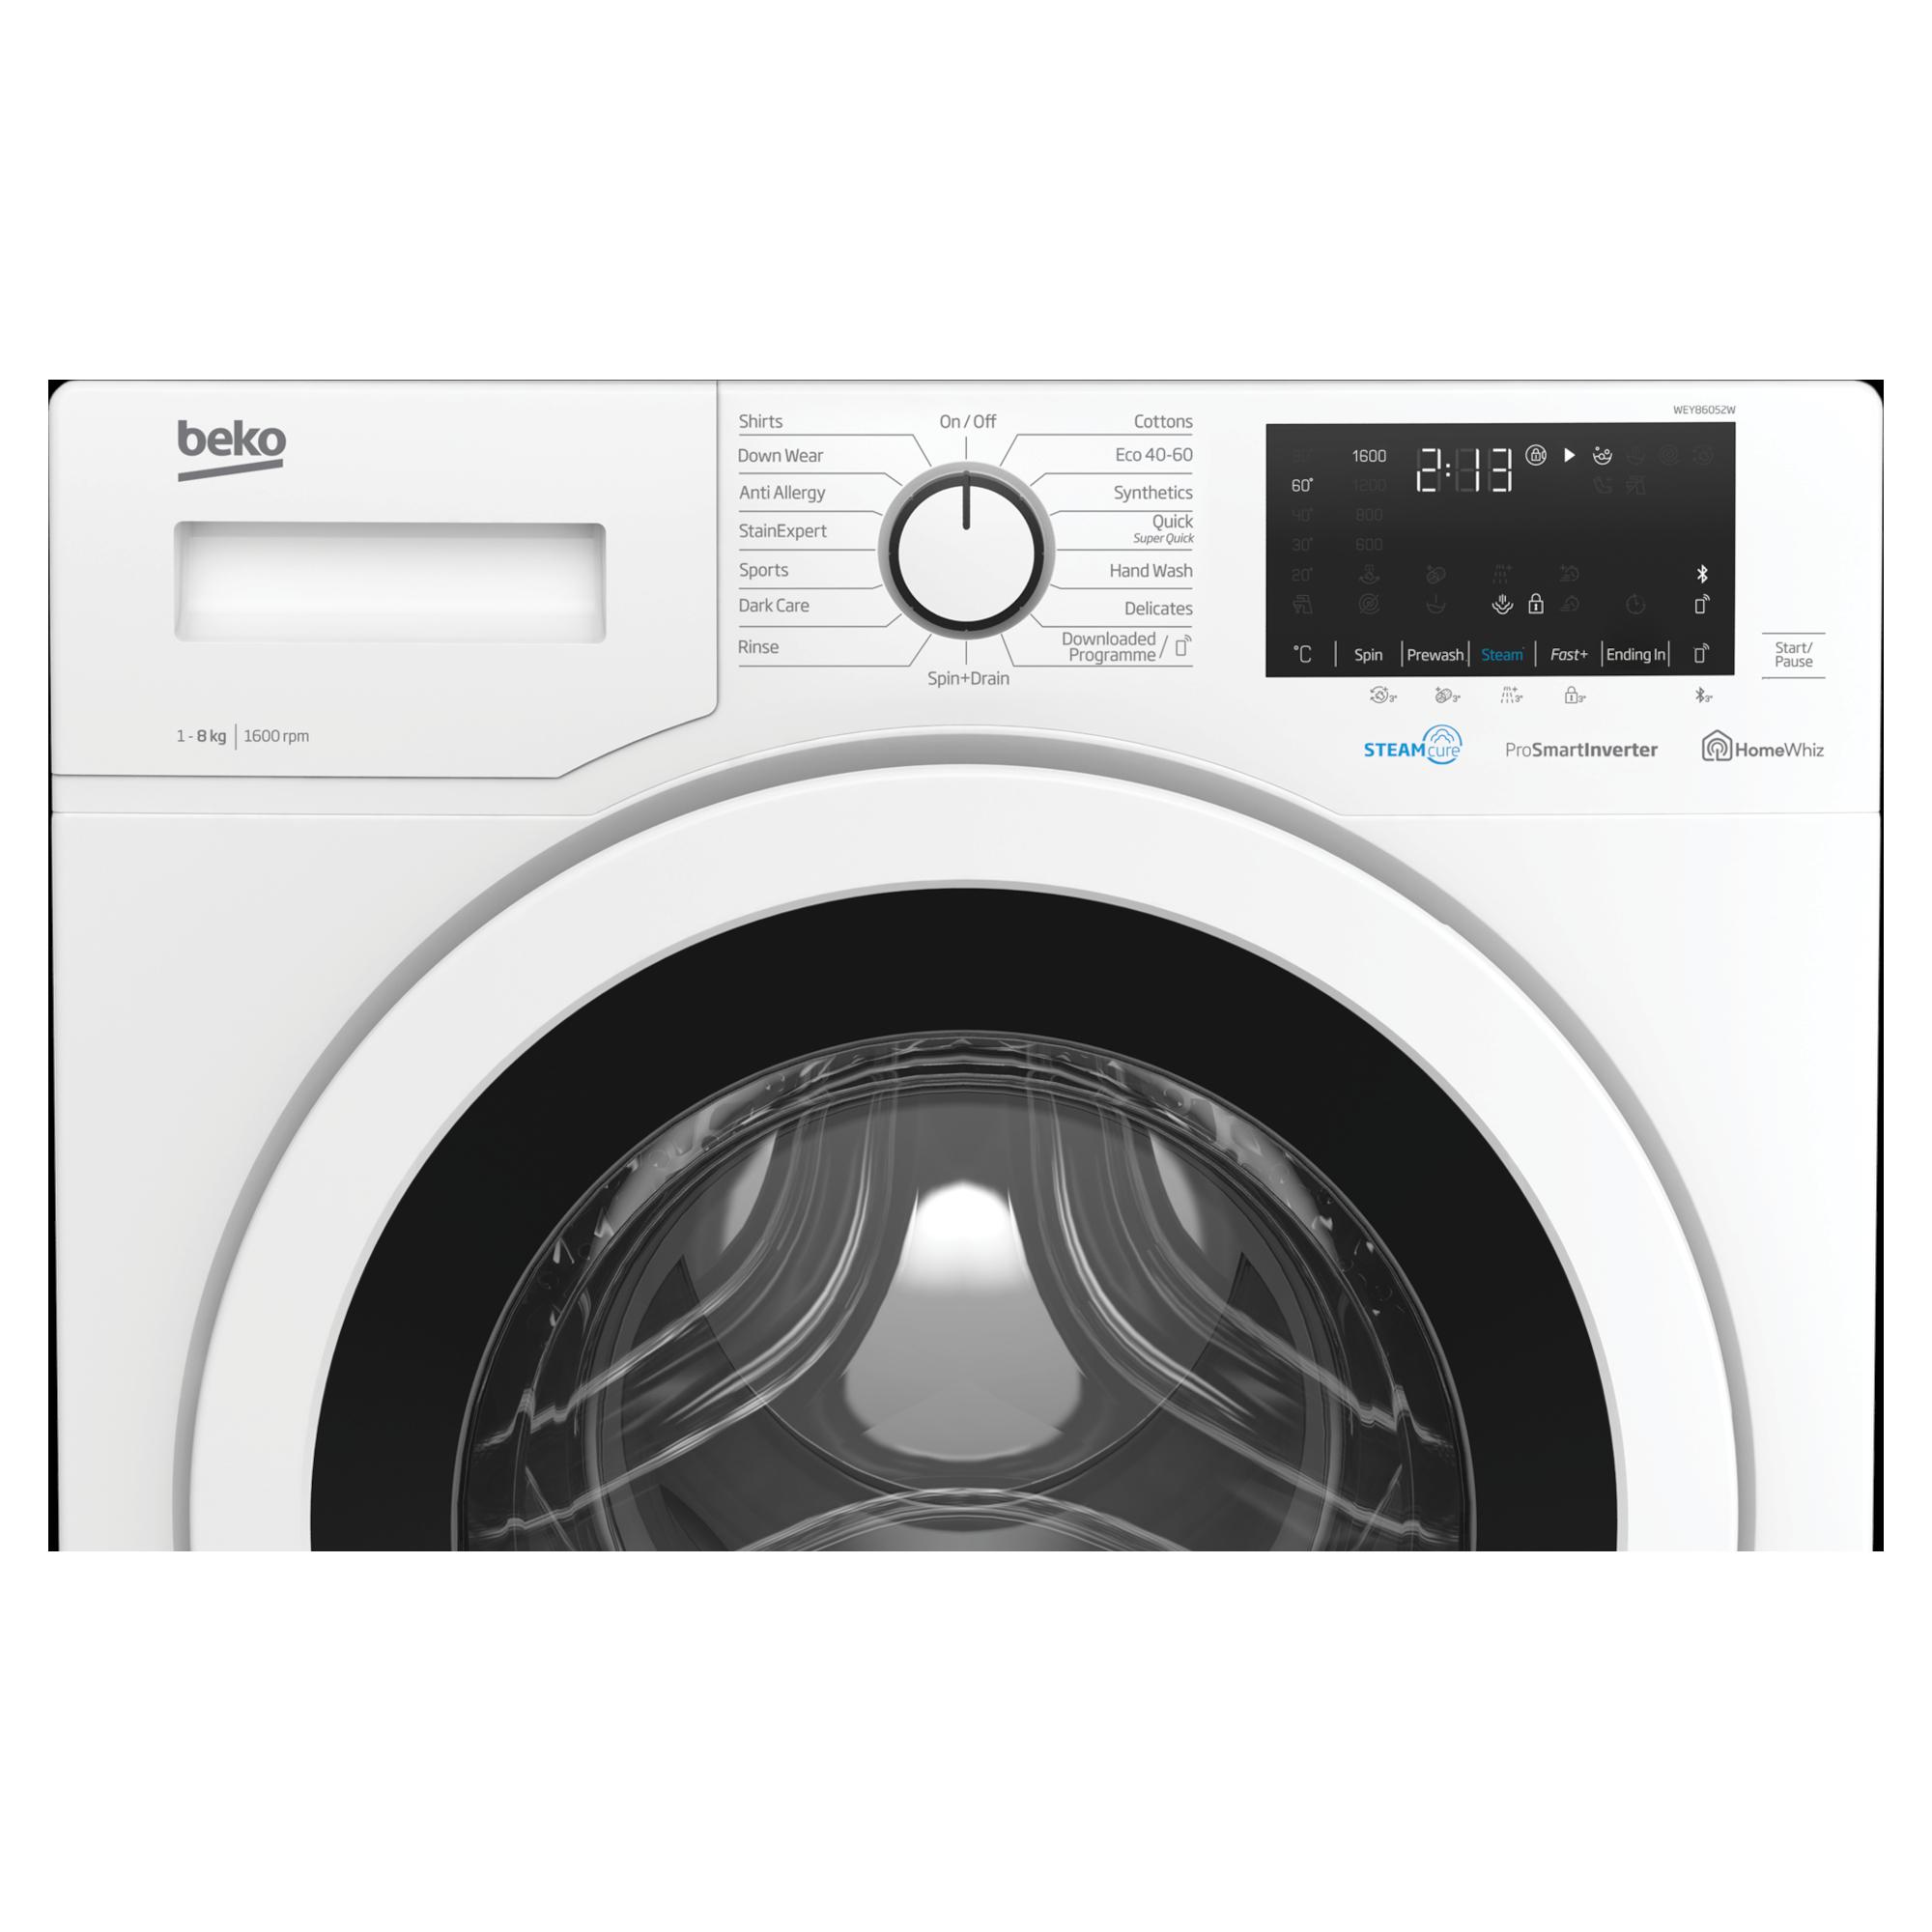 Beko WEY86052W 8kg 1600rpm Washing Machine with SteamCure